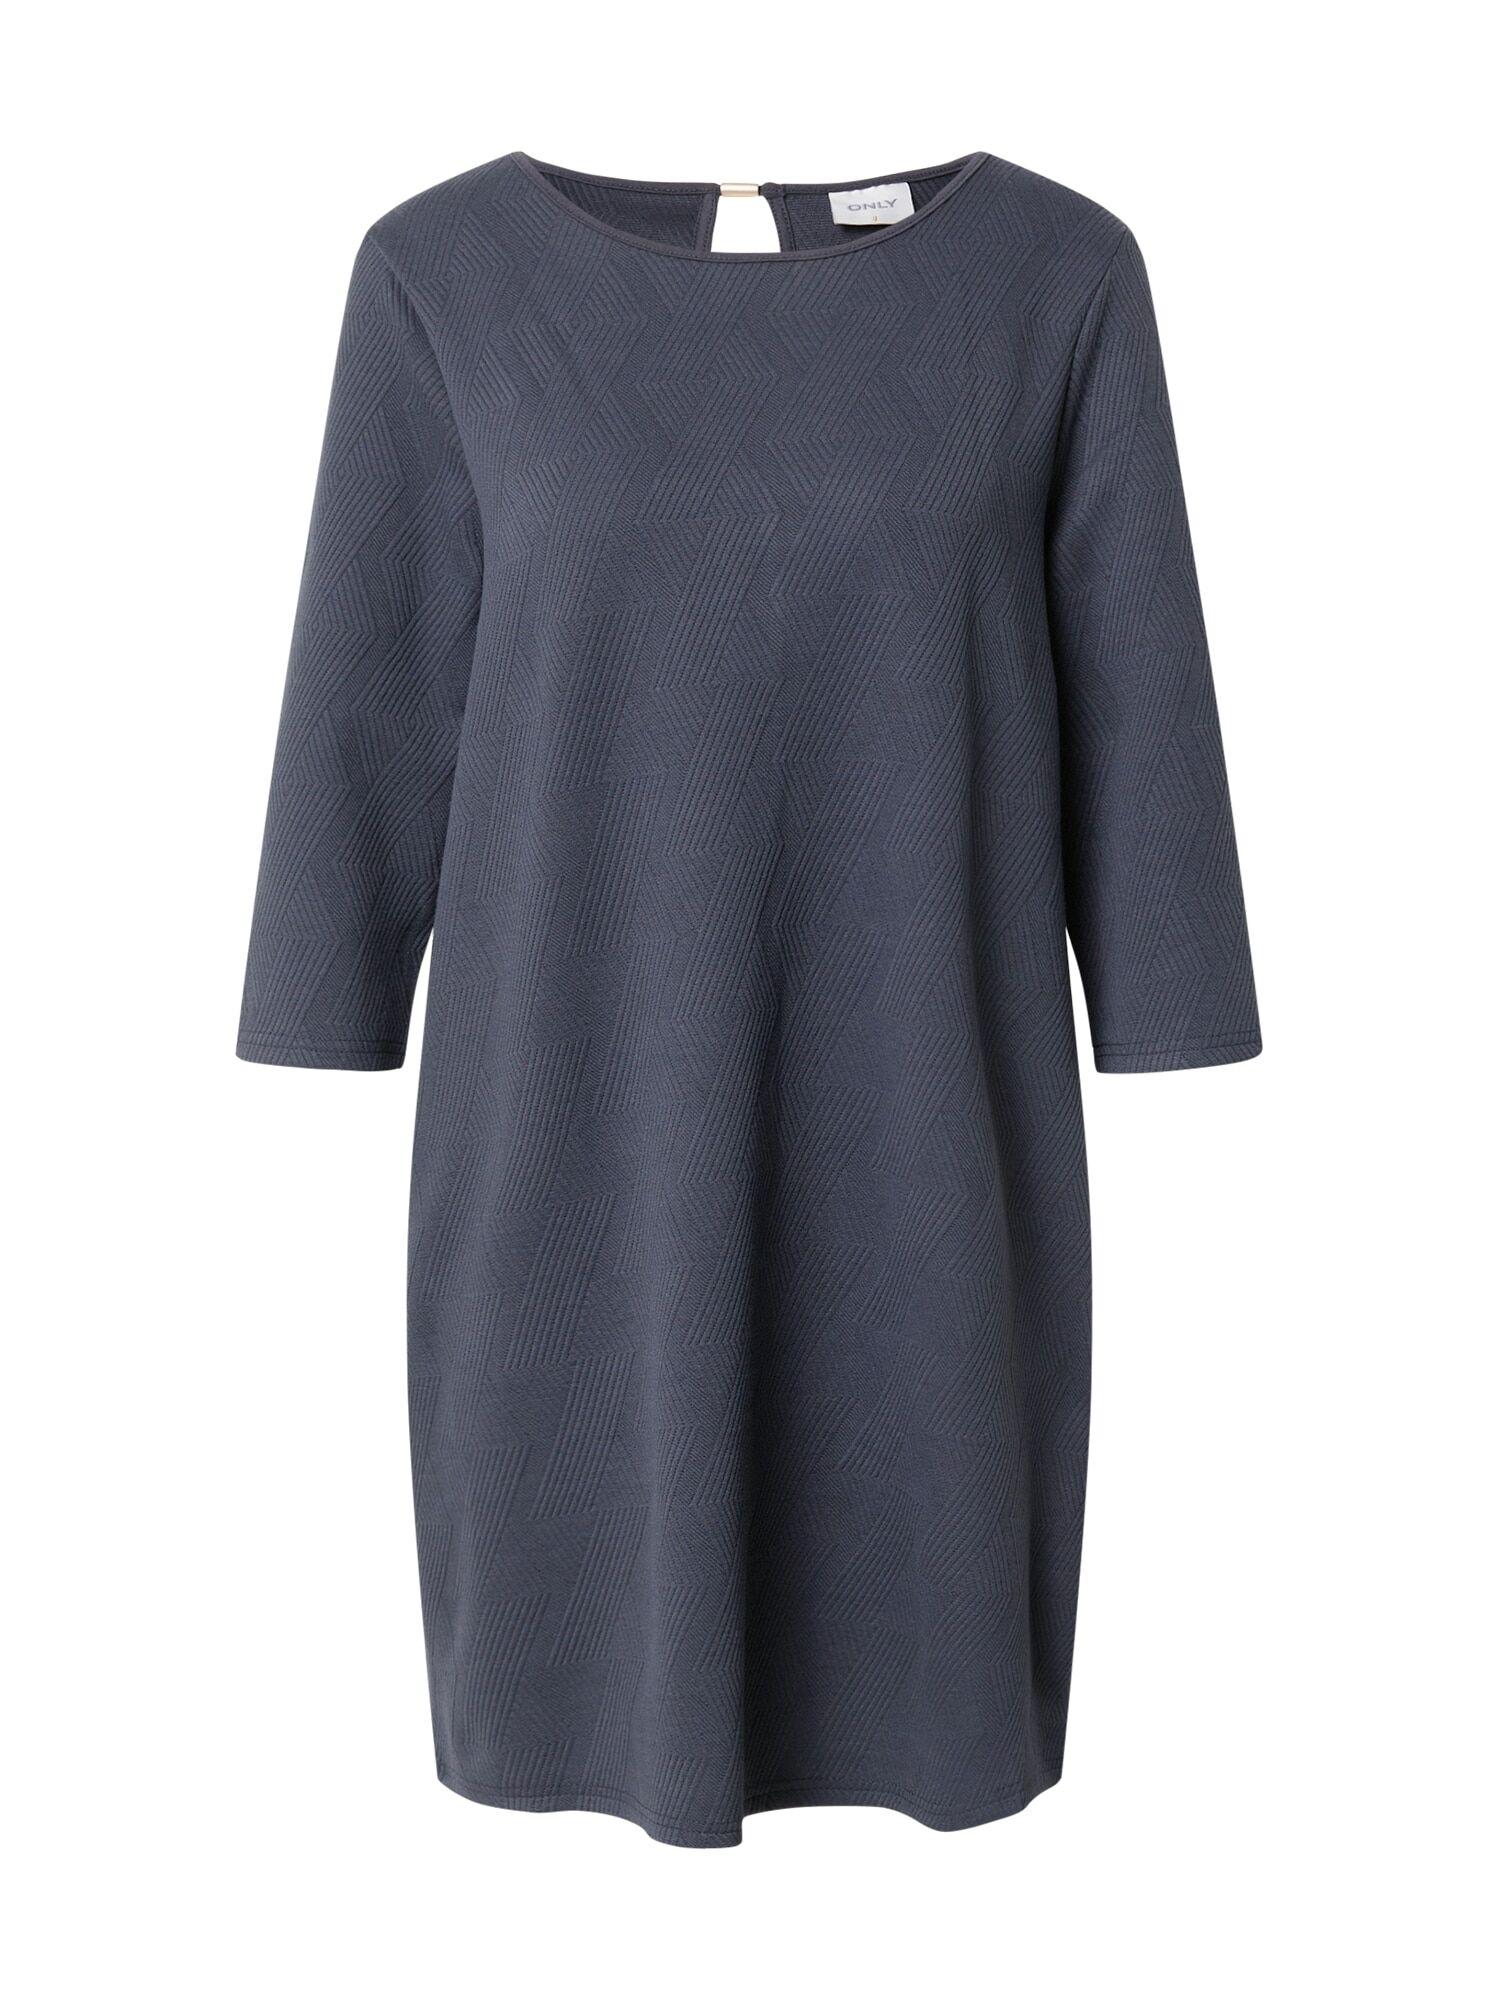 ONLY Robe 'SOJA'  - Bleu - Taille: S - female